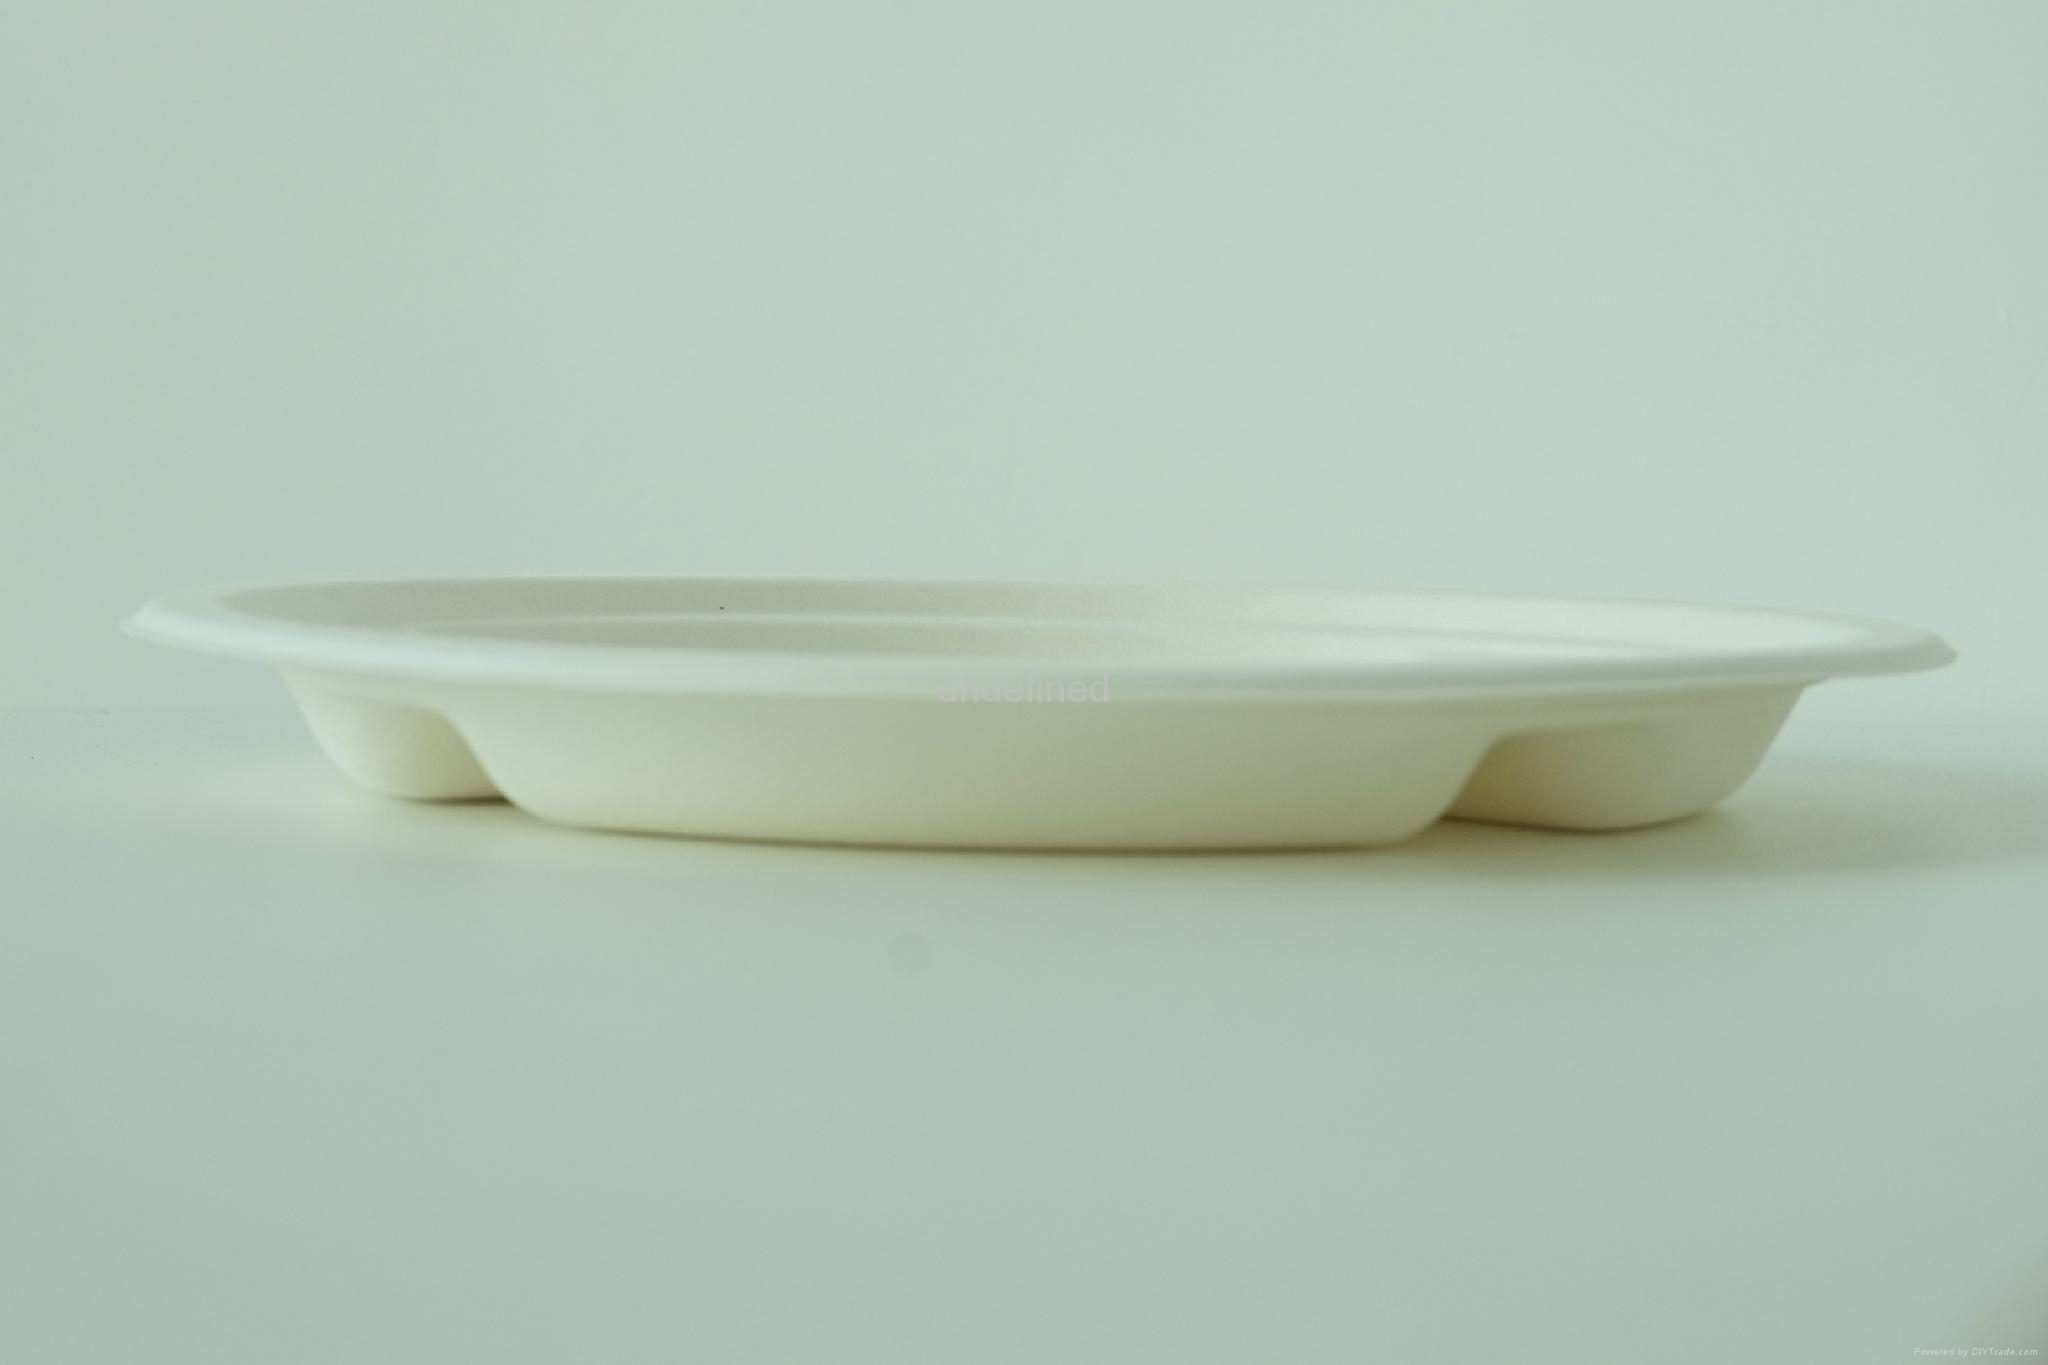 "Biodegradable Paper Pulp Sugarcane Bagasse Tableware 3Compartment Plate10"" 4"